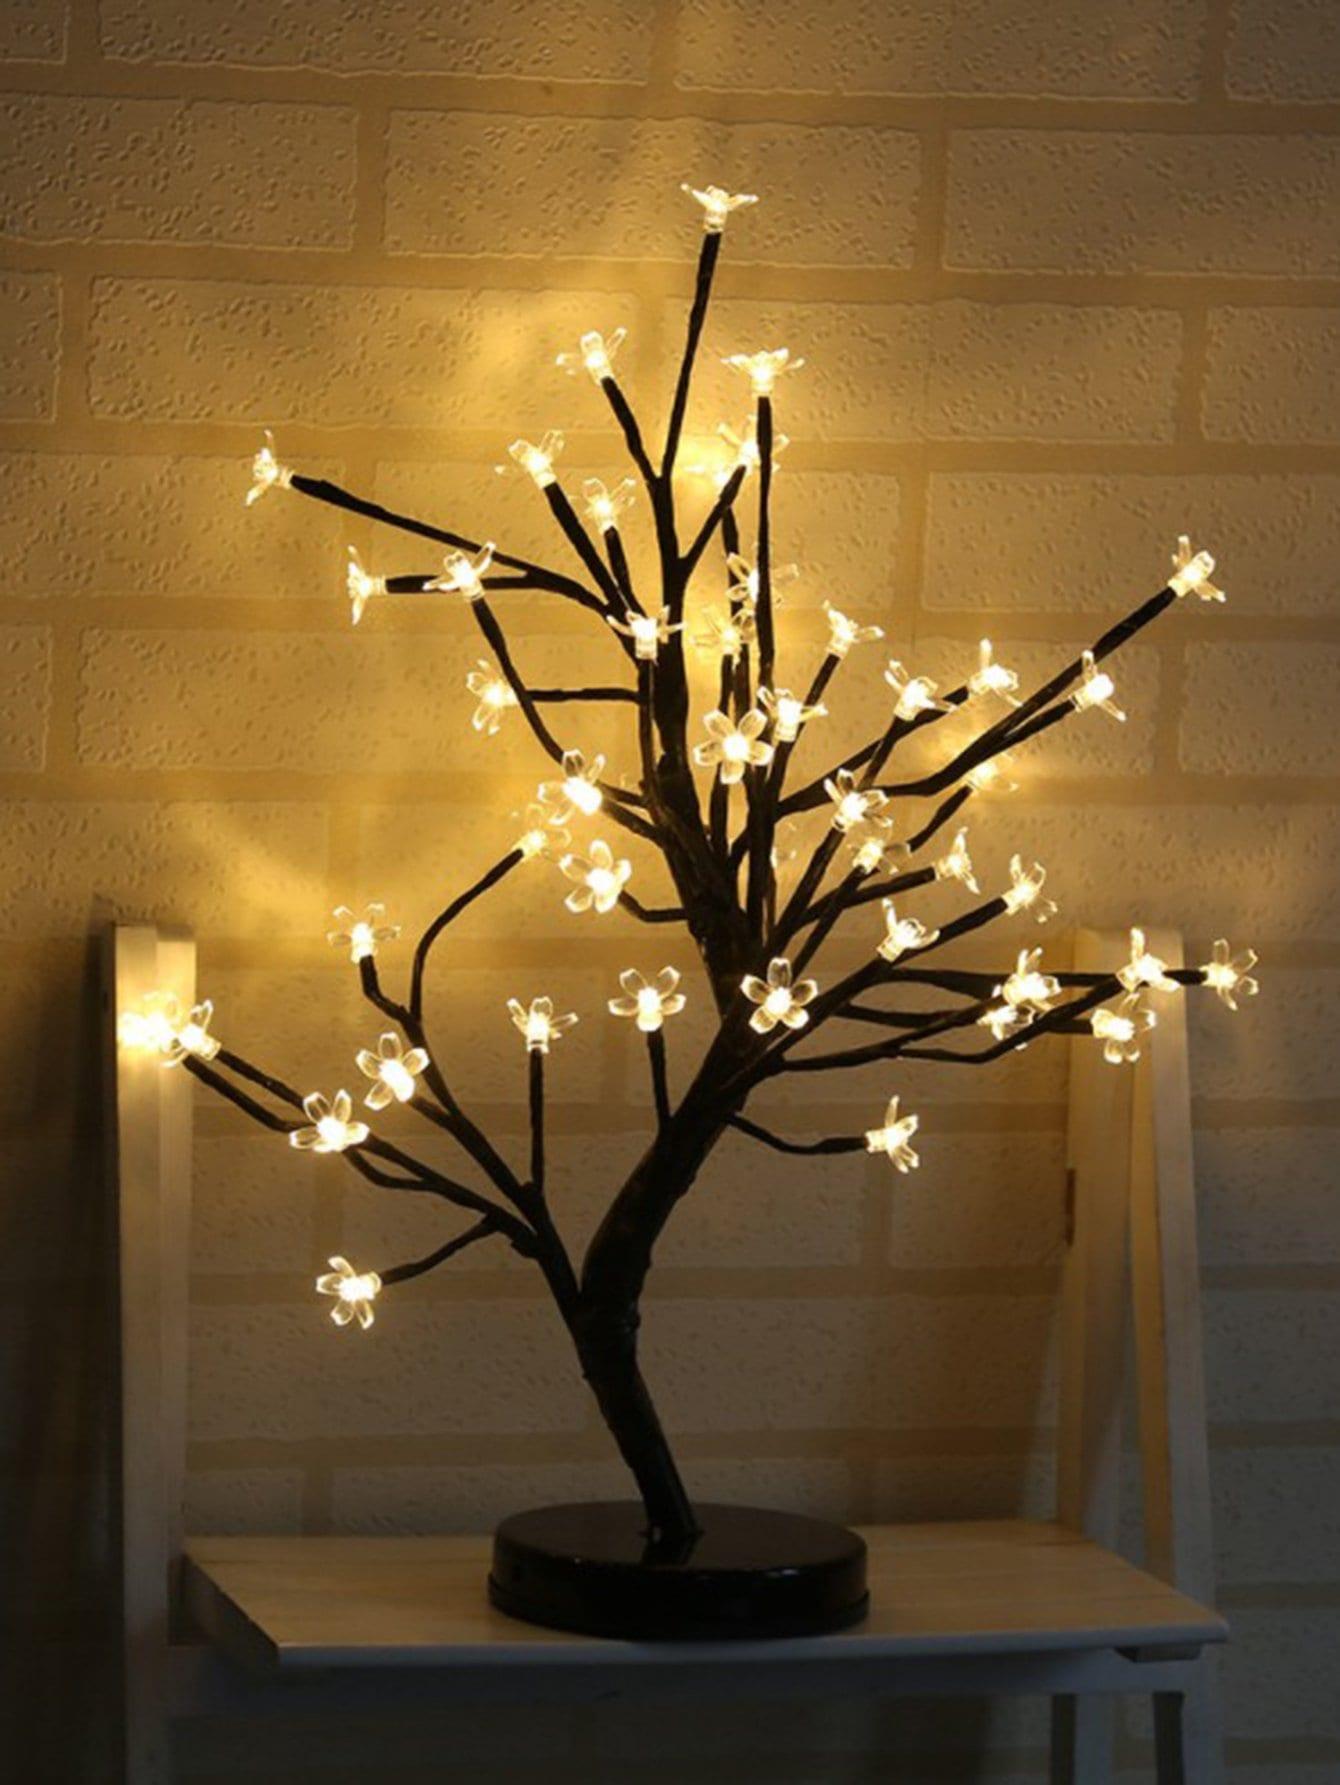 Купить 20шт.дерево Форма Настольная лампа 12V, null, SheIn